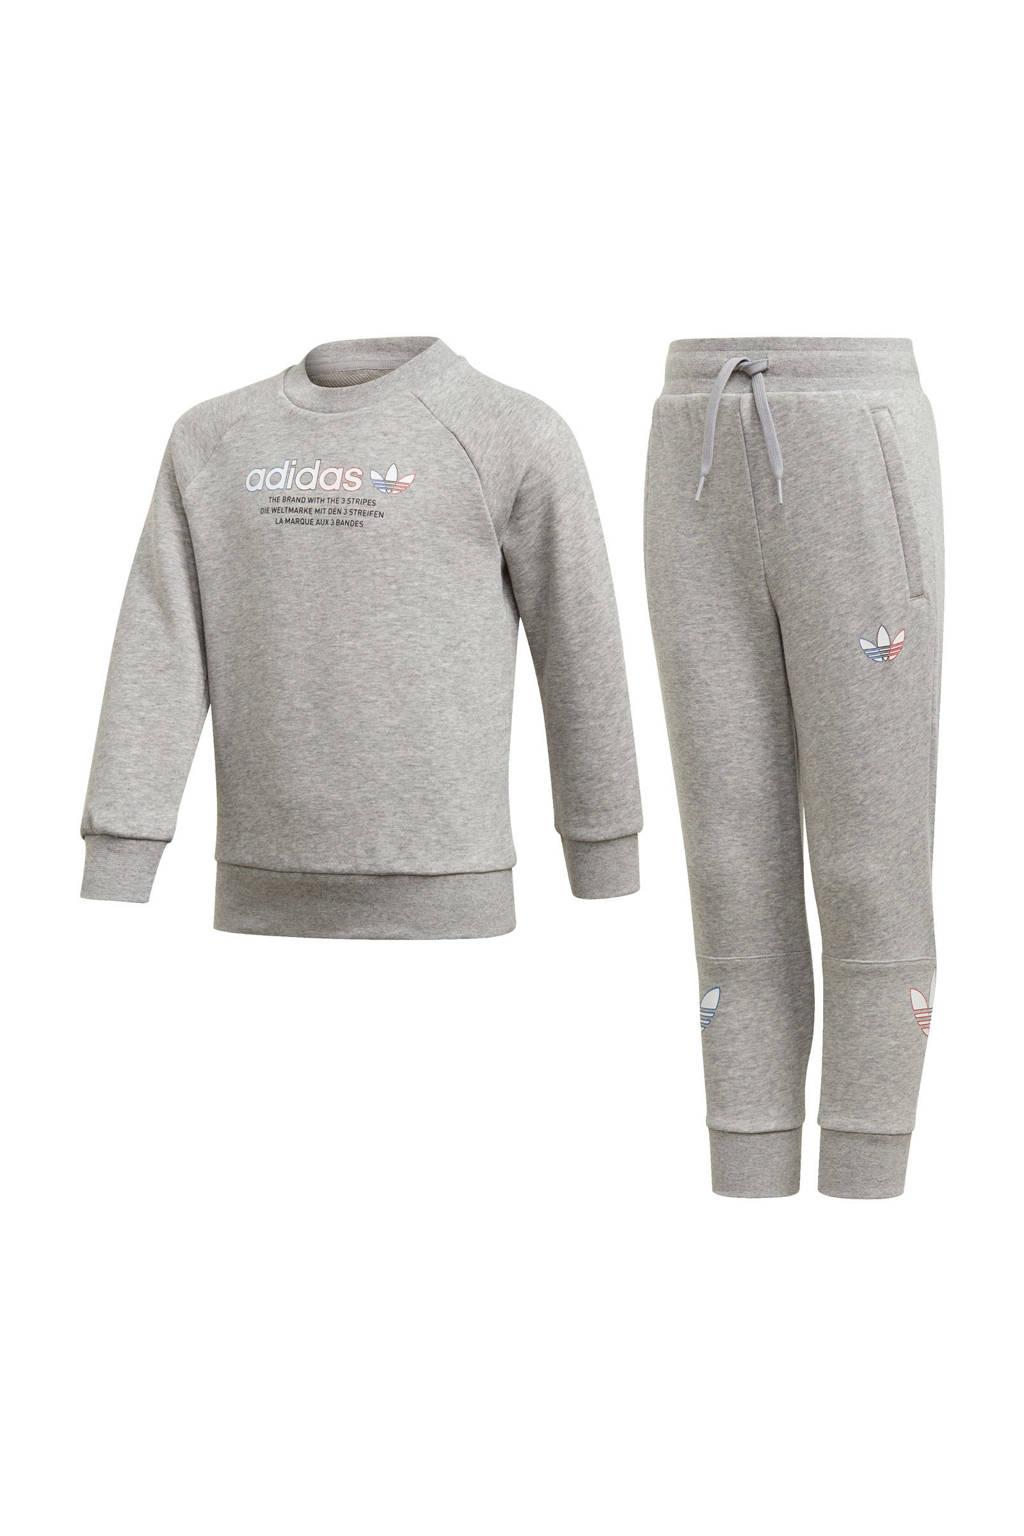 adidas Originals   Adicolor trainingspak grijs melange, Grijs melange